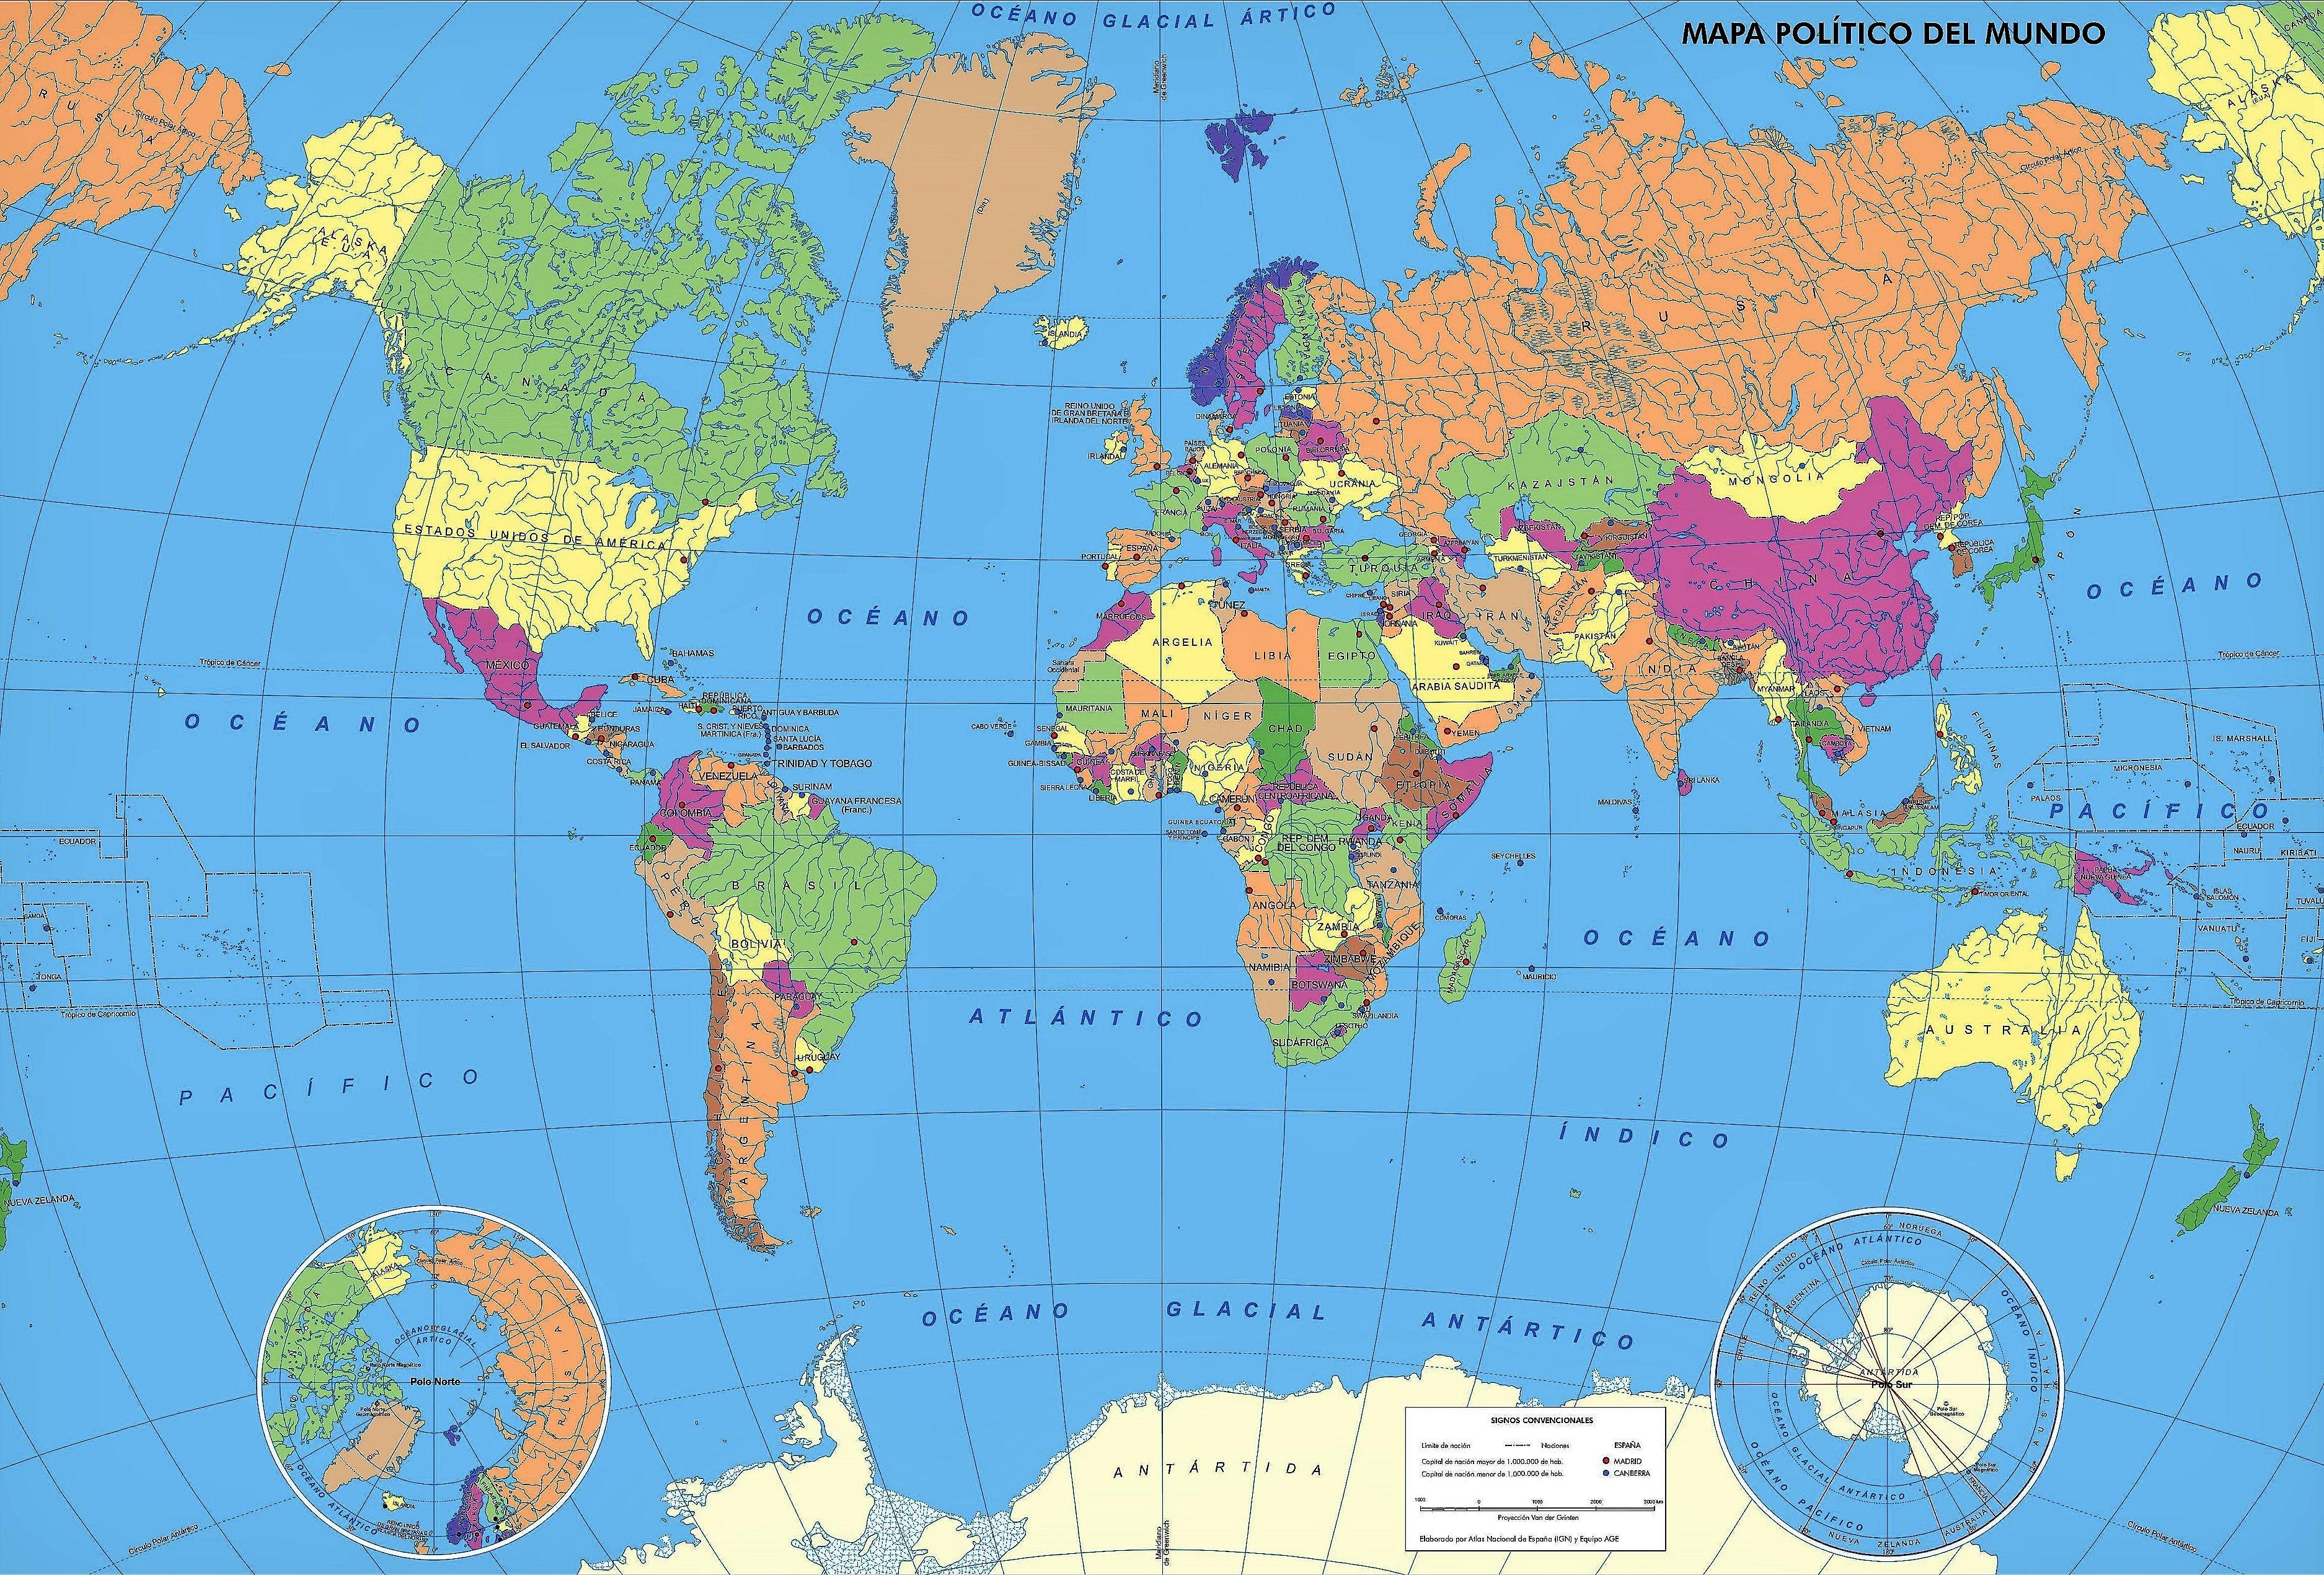 Unmistakable El Mapa Mundi Politico Mapa Mundi Con Sus Respectivos